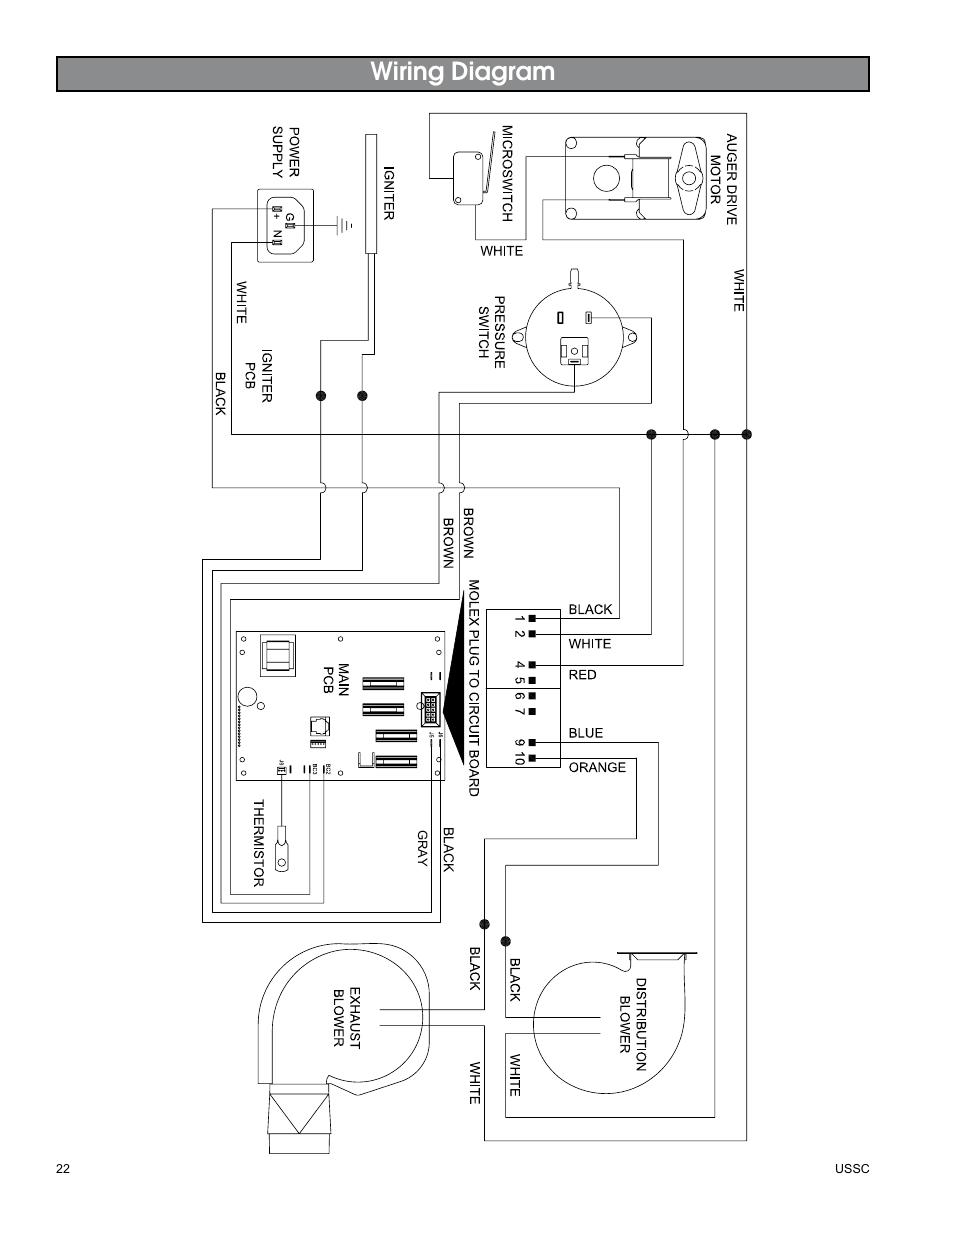 medium resolution of wiring diagram united states stove company king ashley pellet stove 5500m user manual